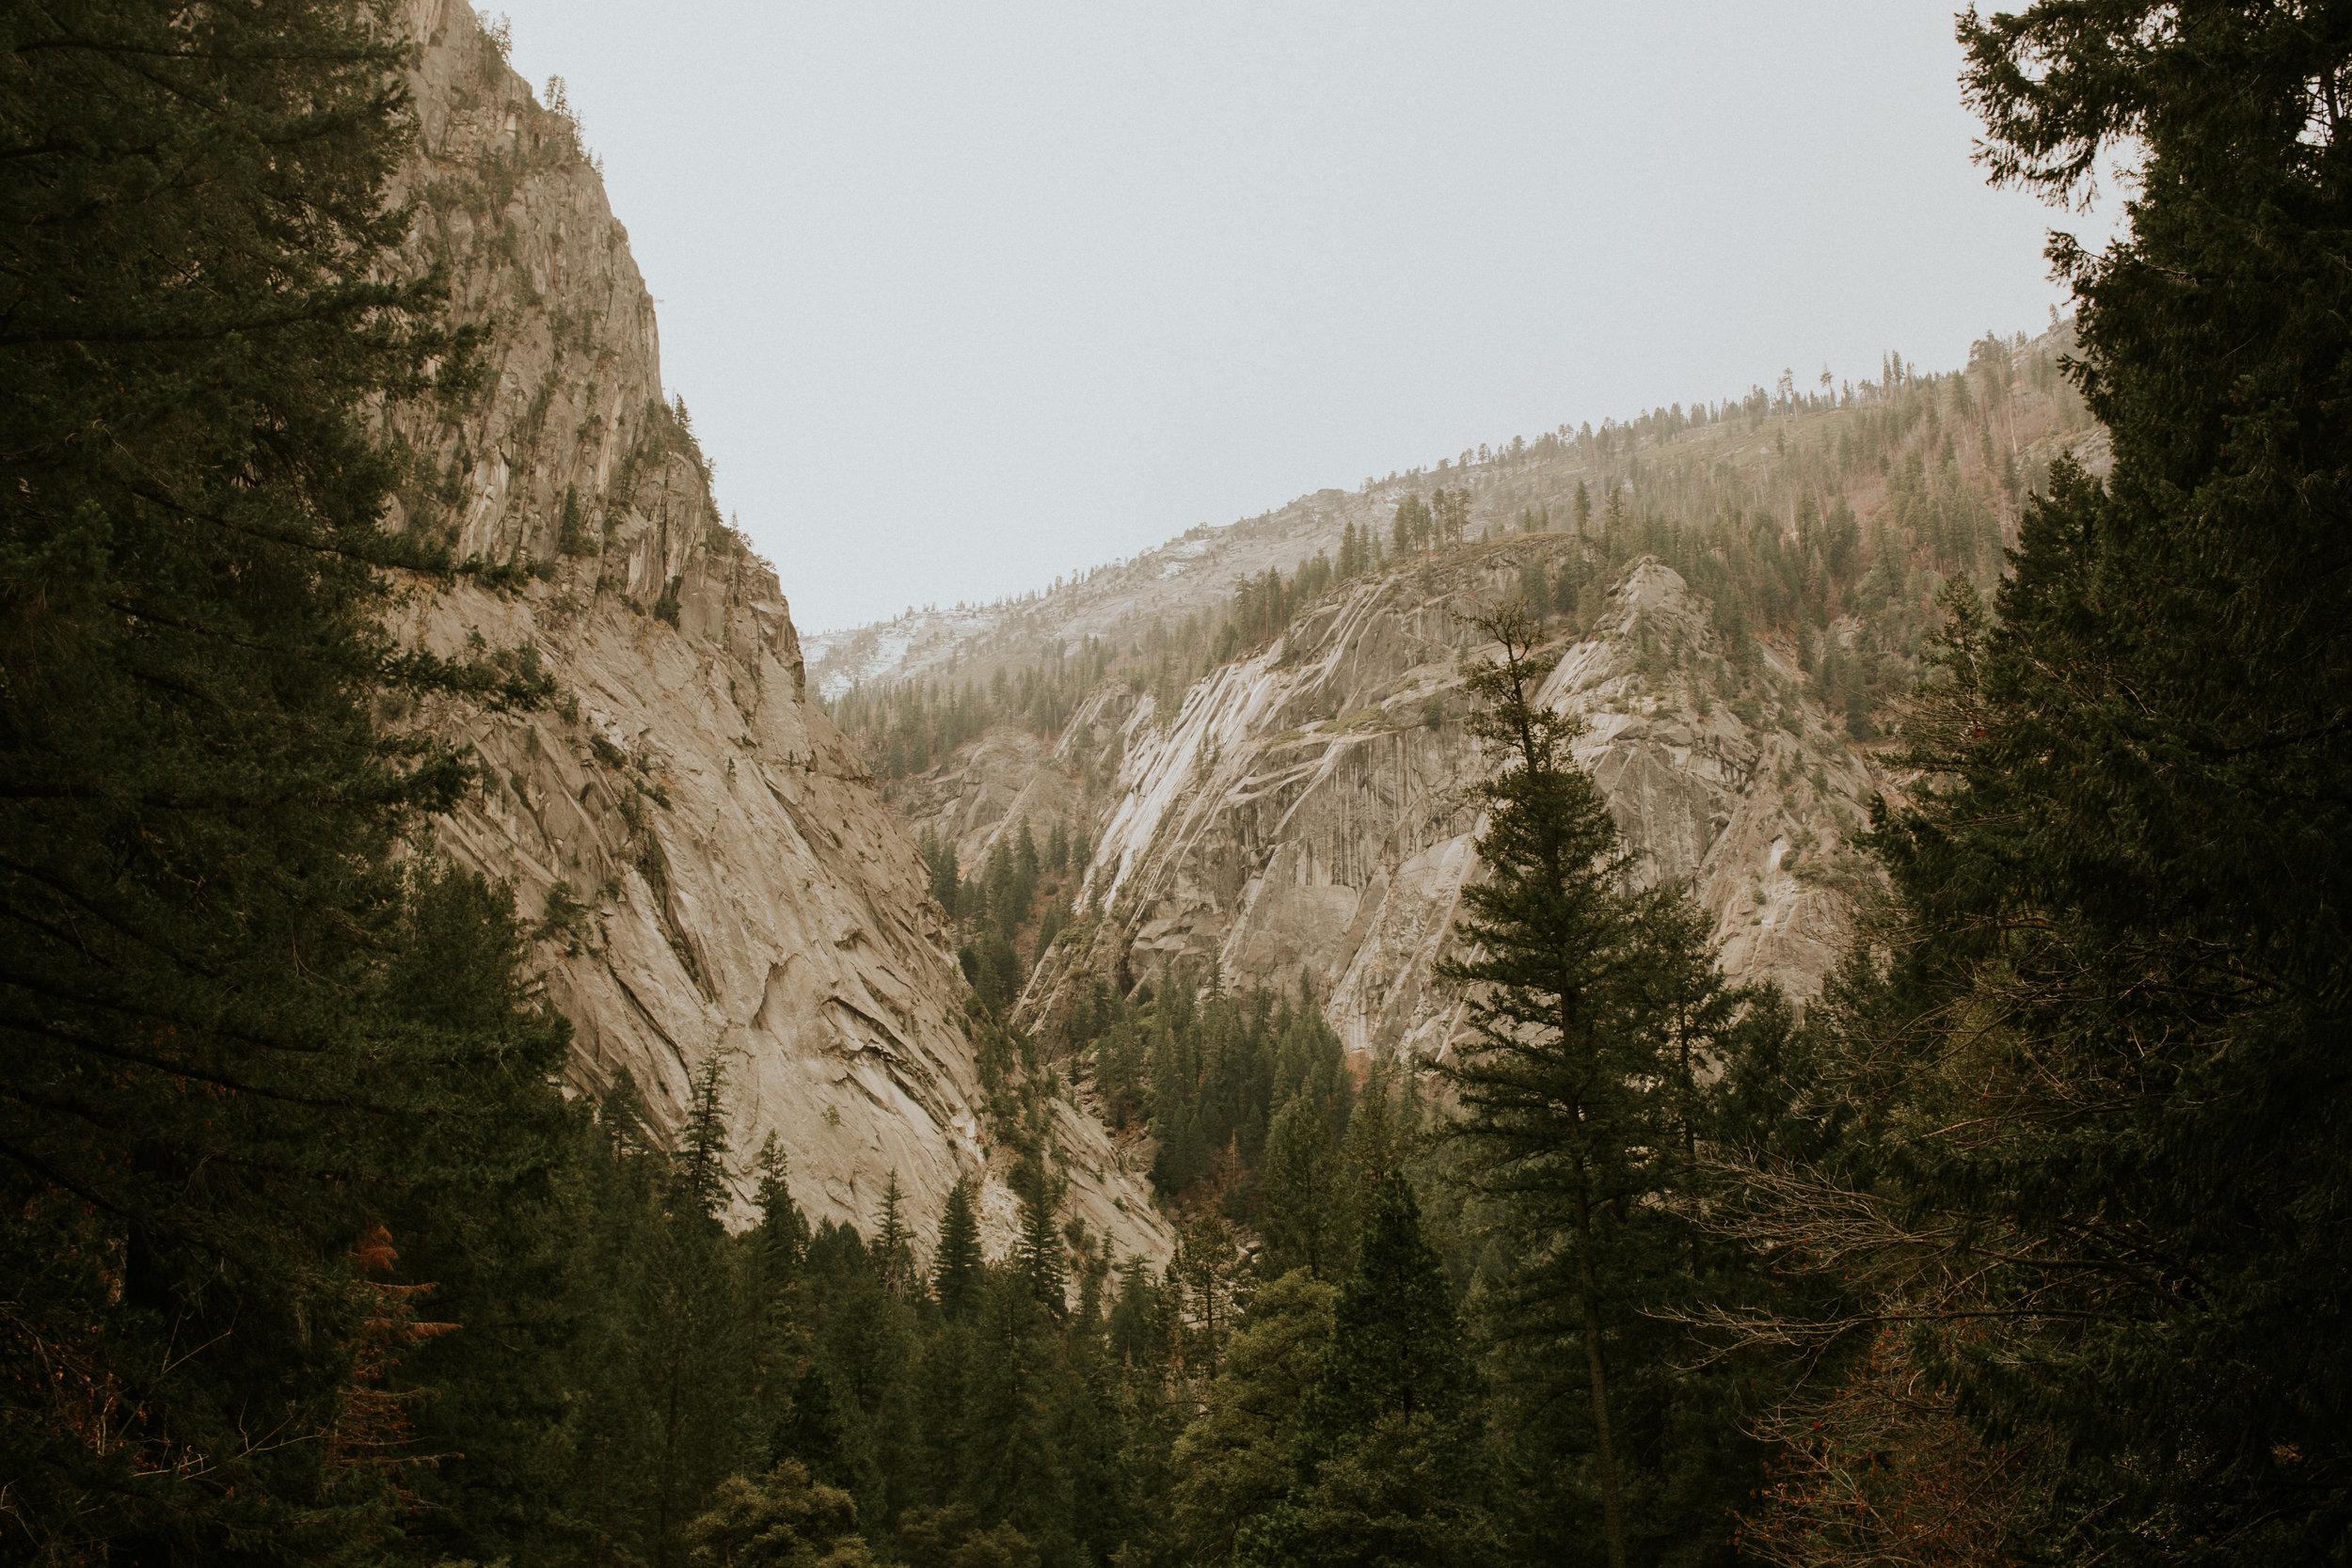 yosemite valley vernal falls elopement photographer Breeanna lasher